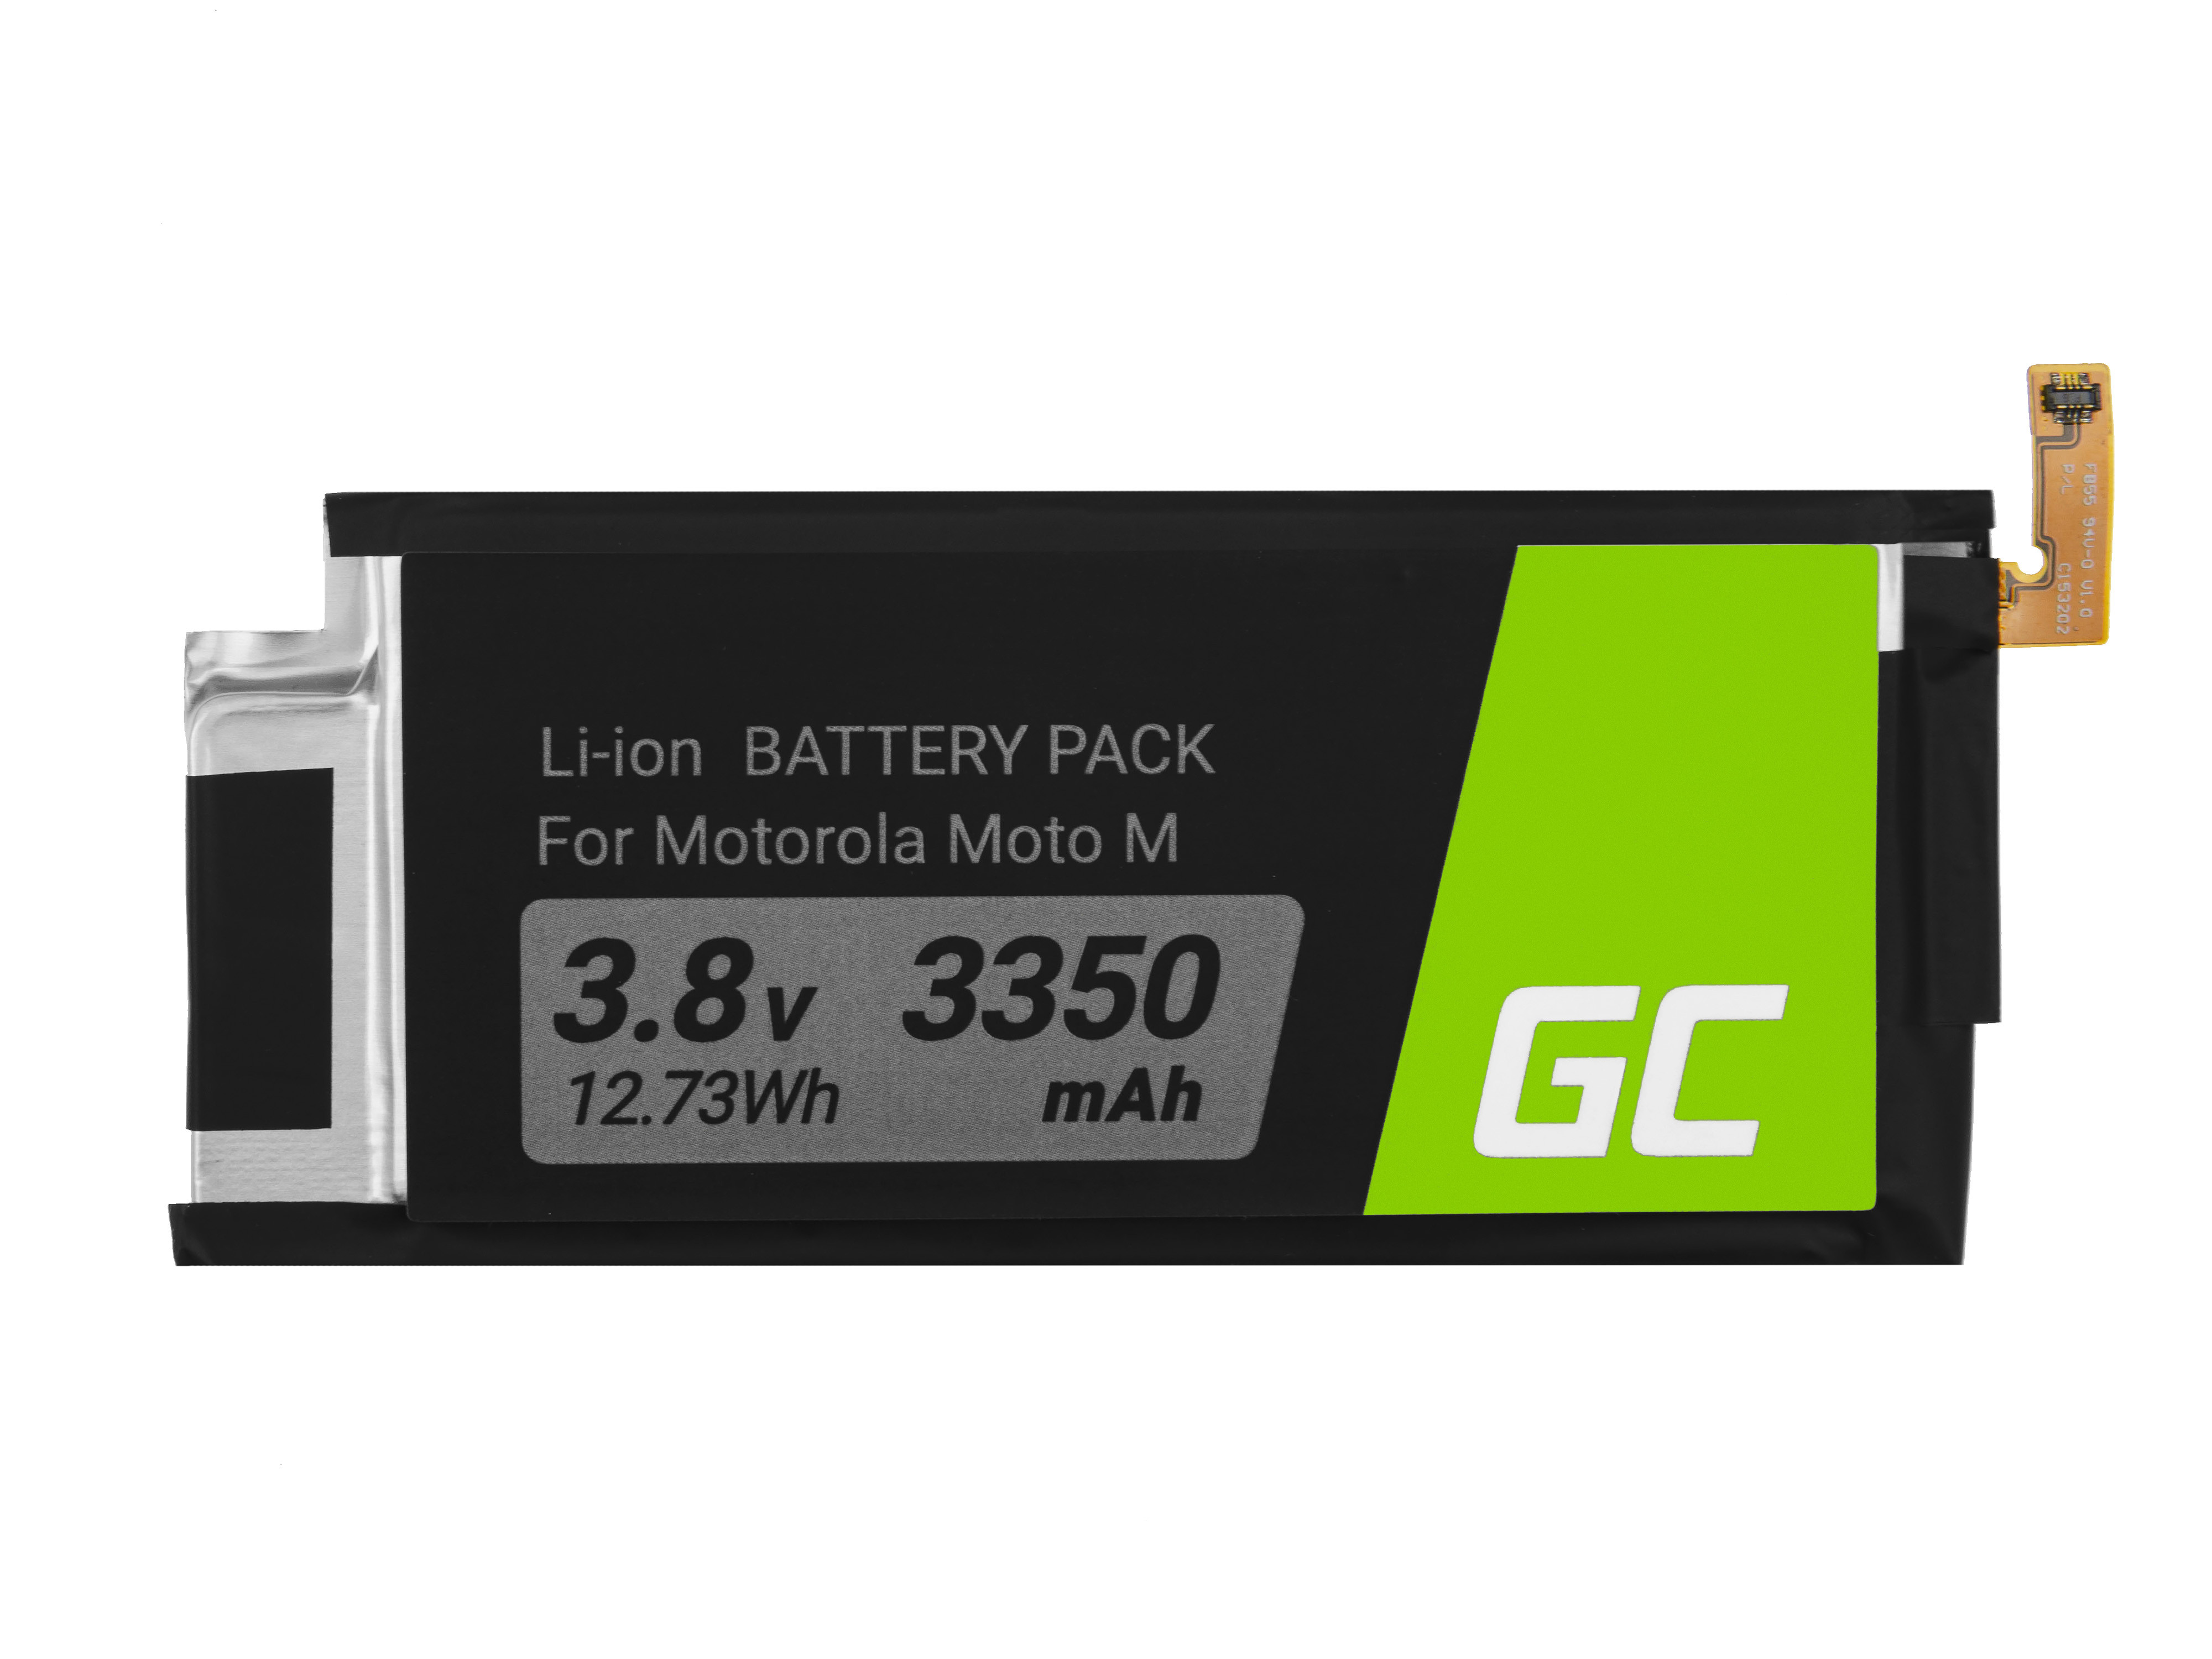 Green Cell BP120 Baterie Motorola FB55, Motorola Moto X Force Moto M 3350mAh Li-Ion – neoriginální